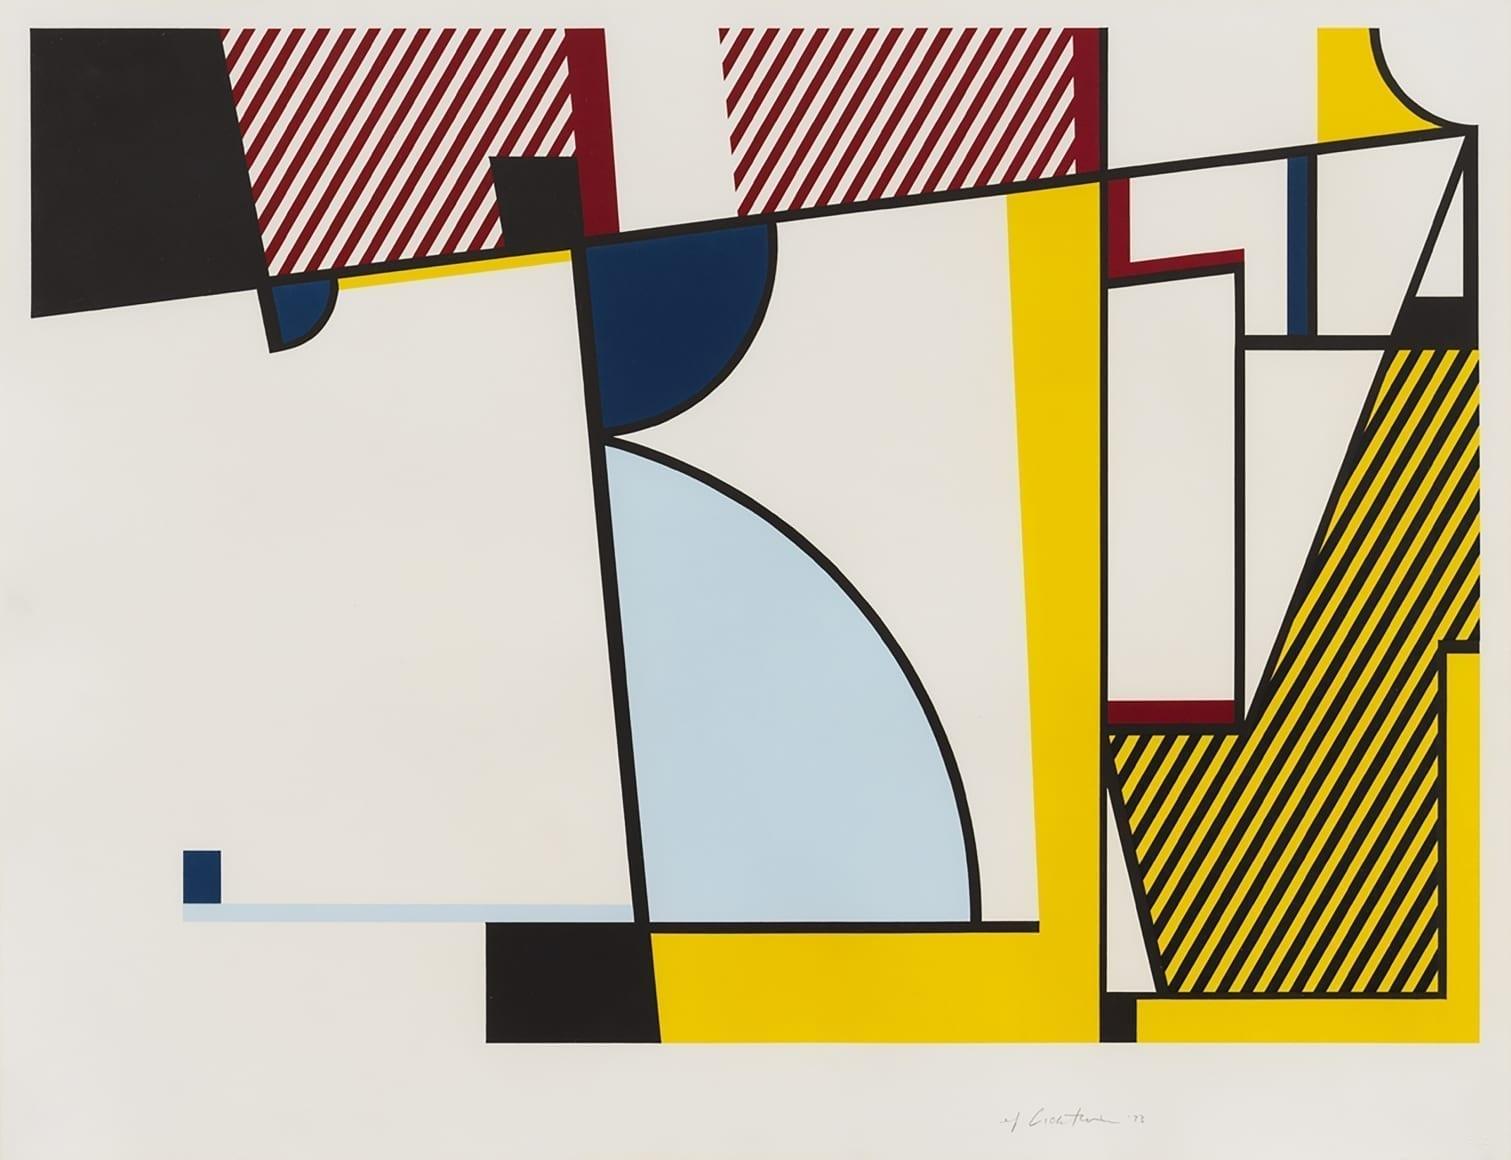 1973 Medium: Screenprint, lithograph, and linocut